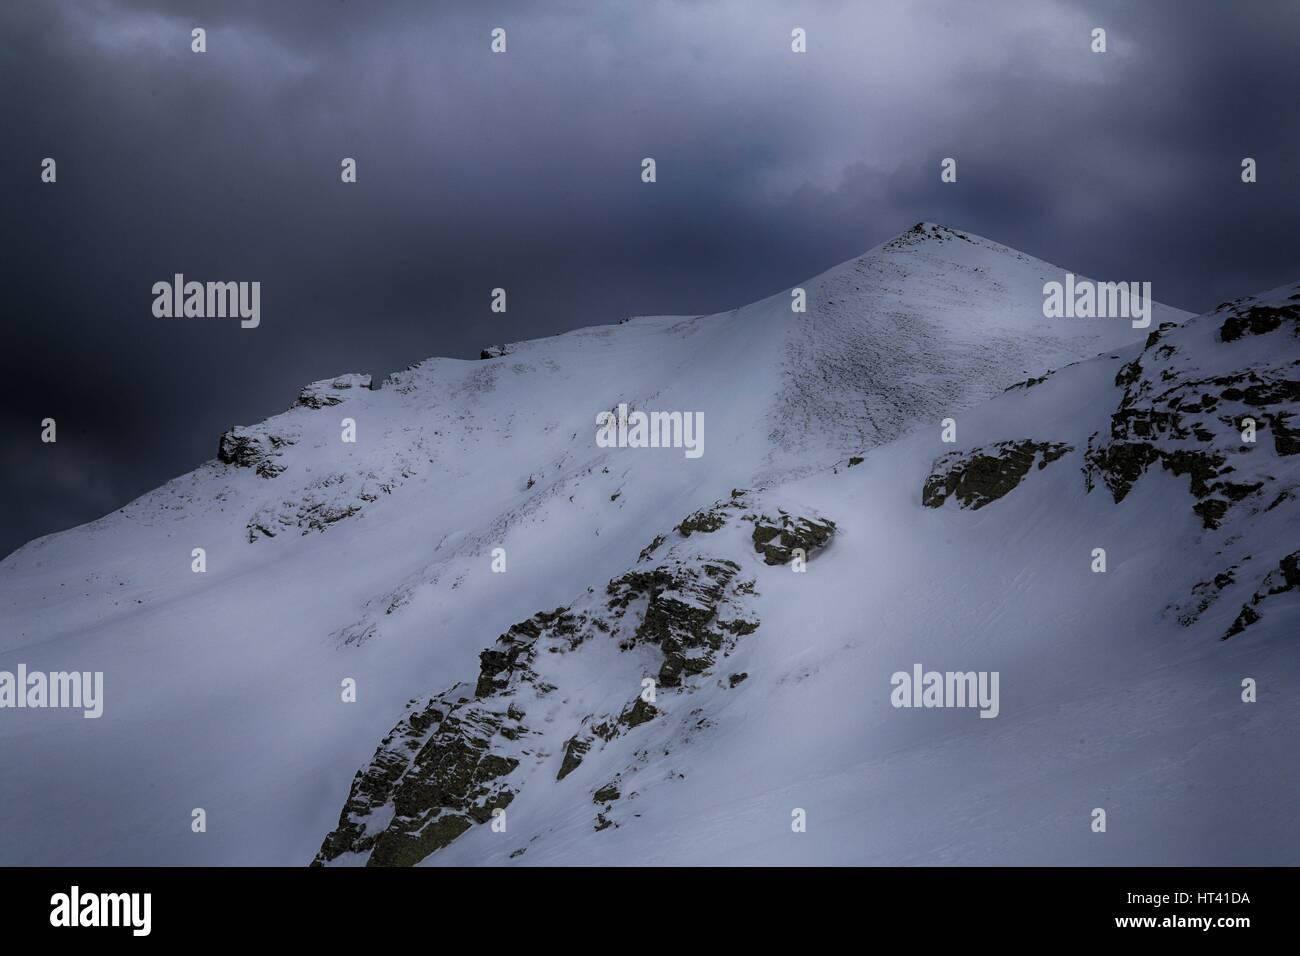 Rudoka / Maja e Njeriut the highest peak of Kosovo on the border with Macedonia Stock Photo